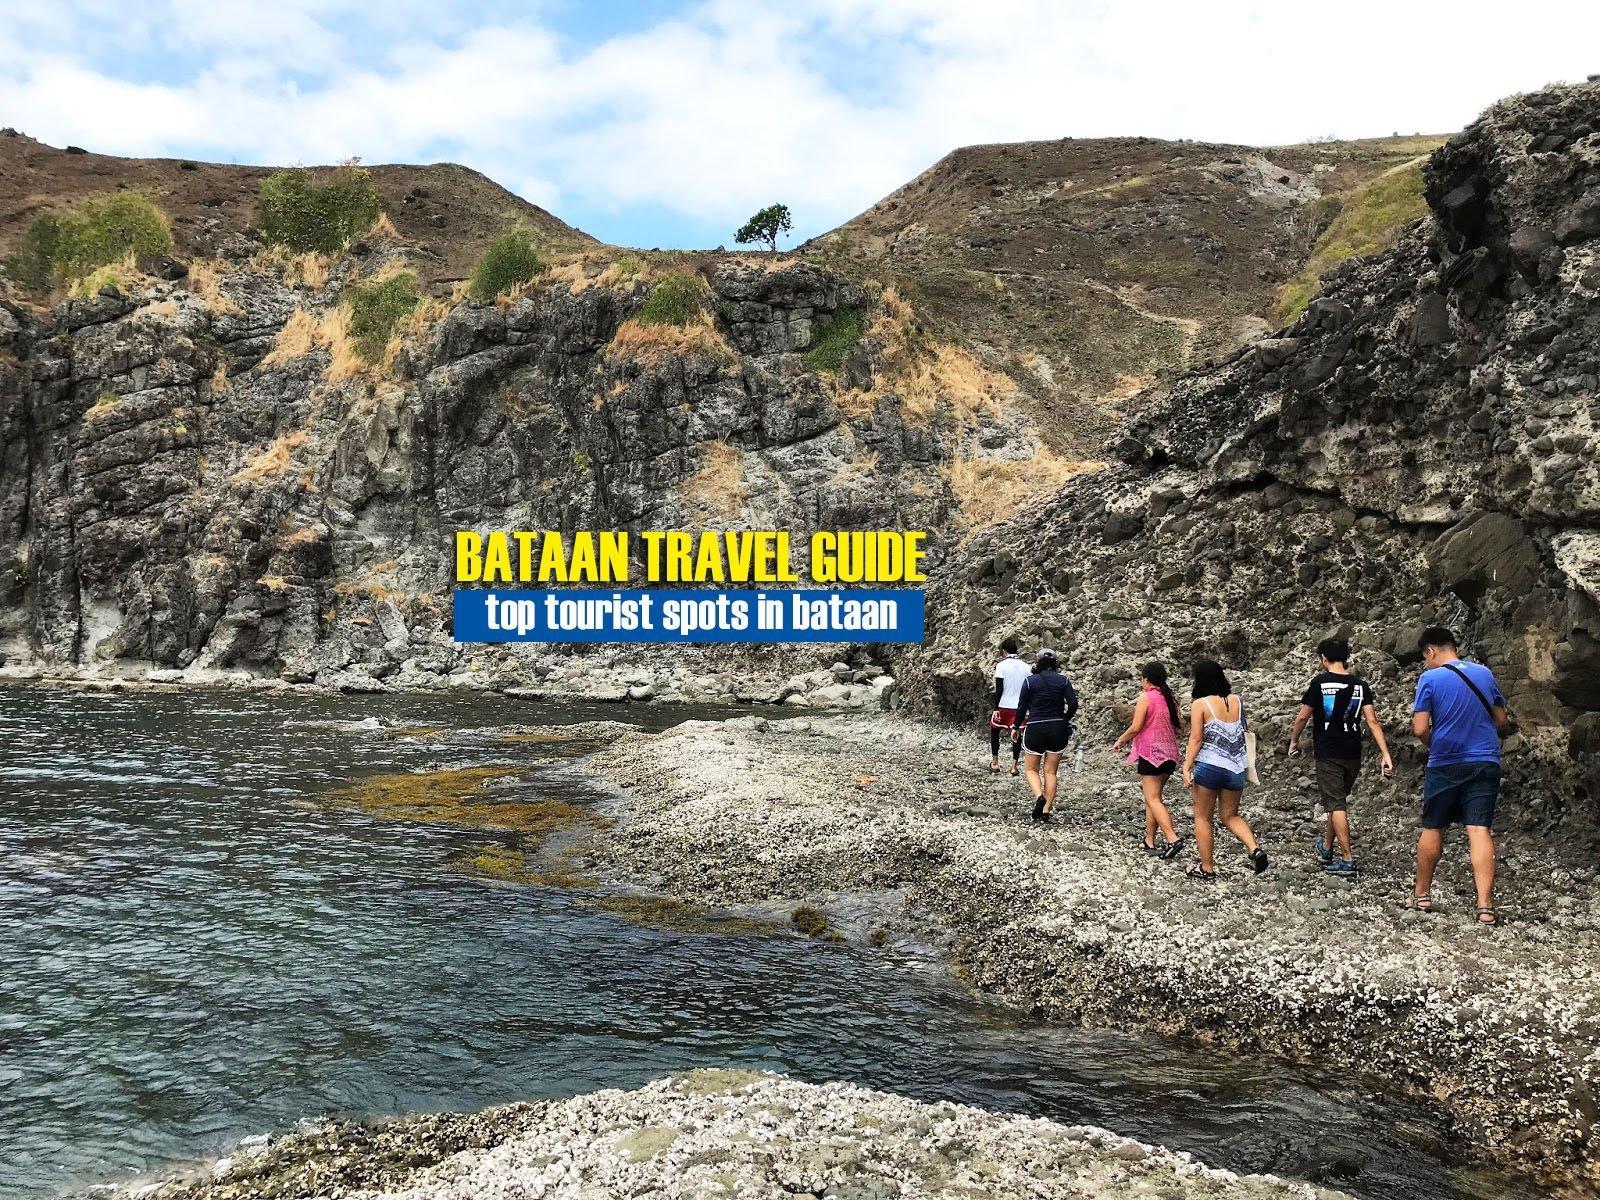 Visiting the Five Fingers Cove of Mariveles, Bataan